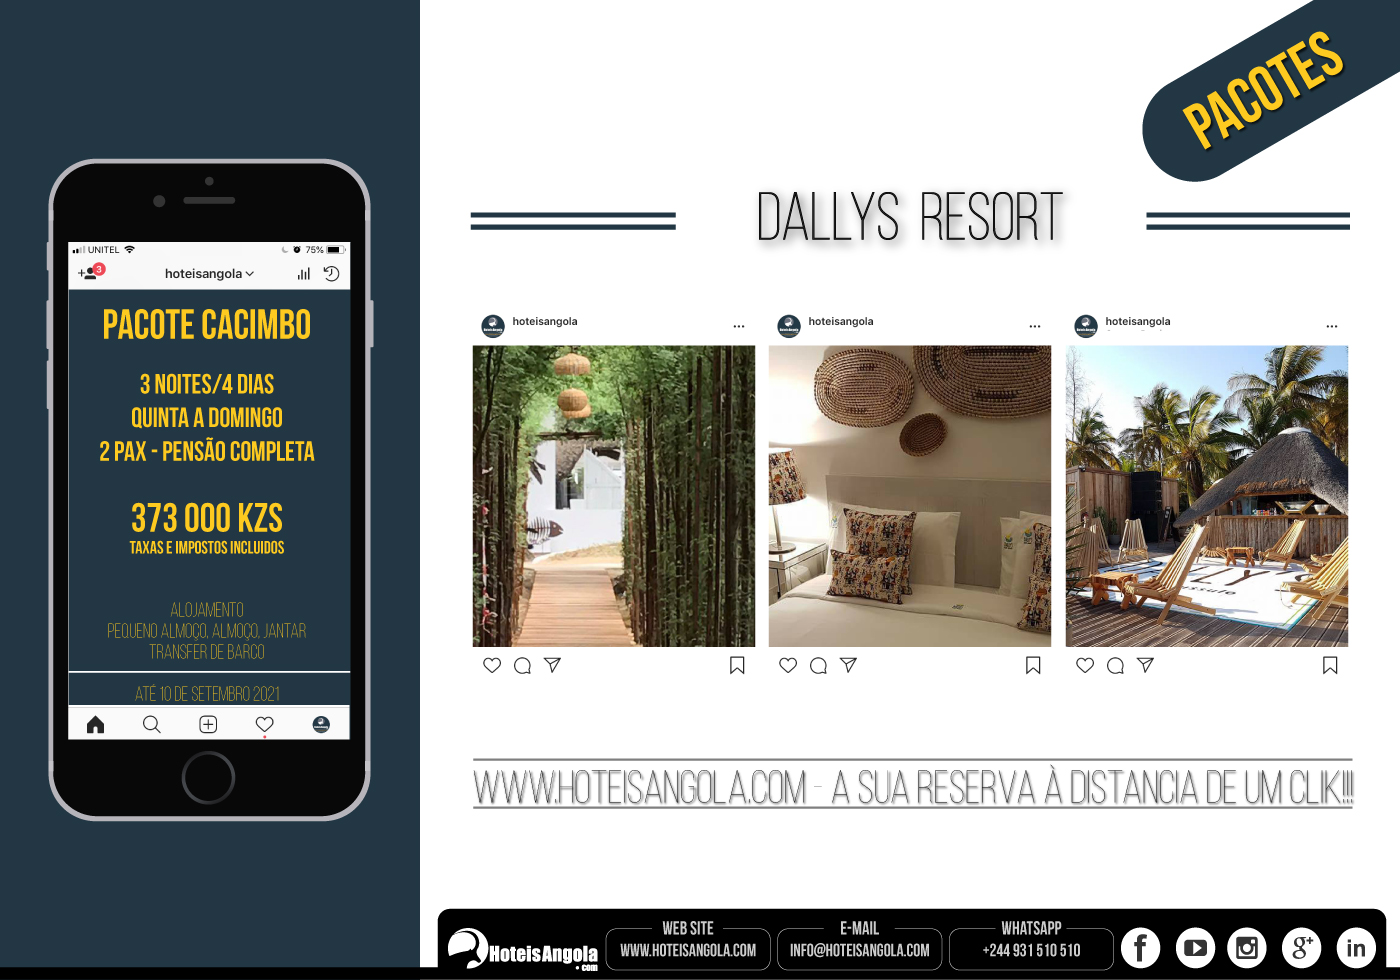 PACOTE - Dallys Resort